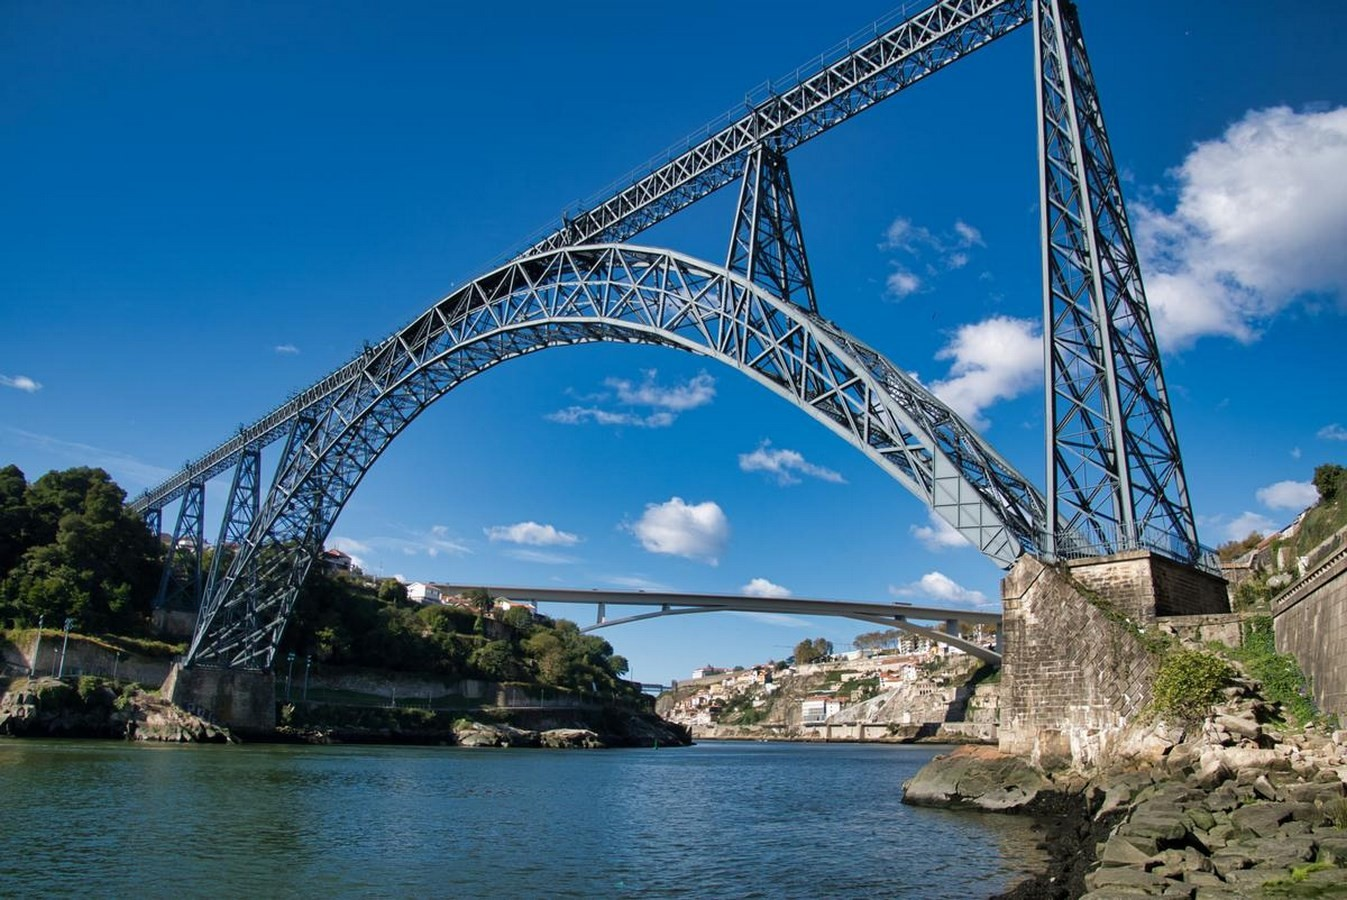 Maria pia bridge, Portugal - 1877 - Sheet